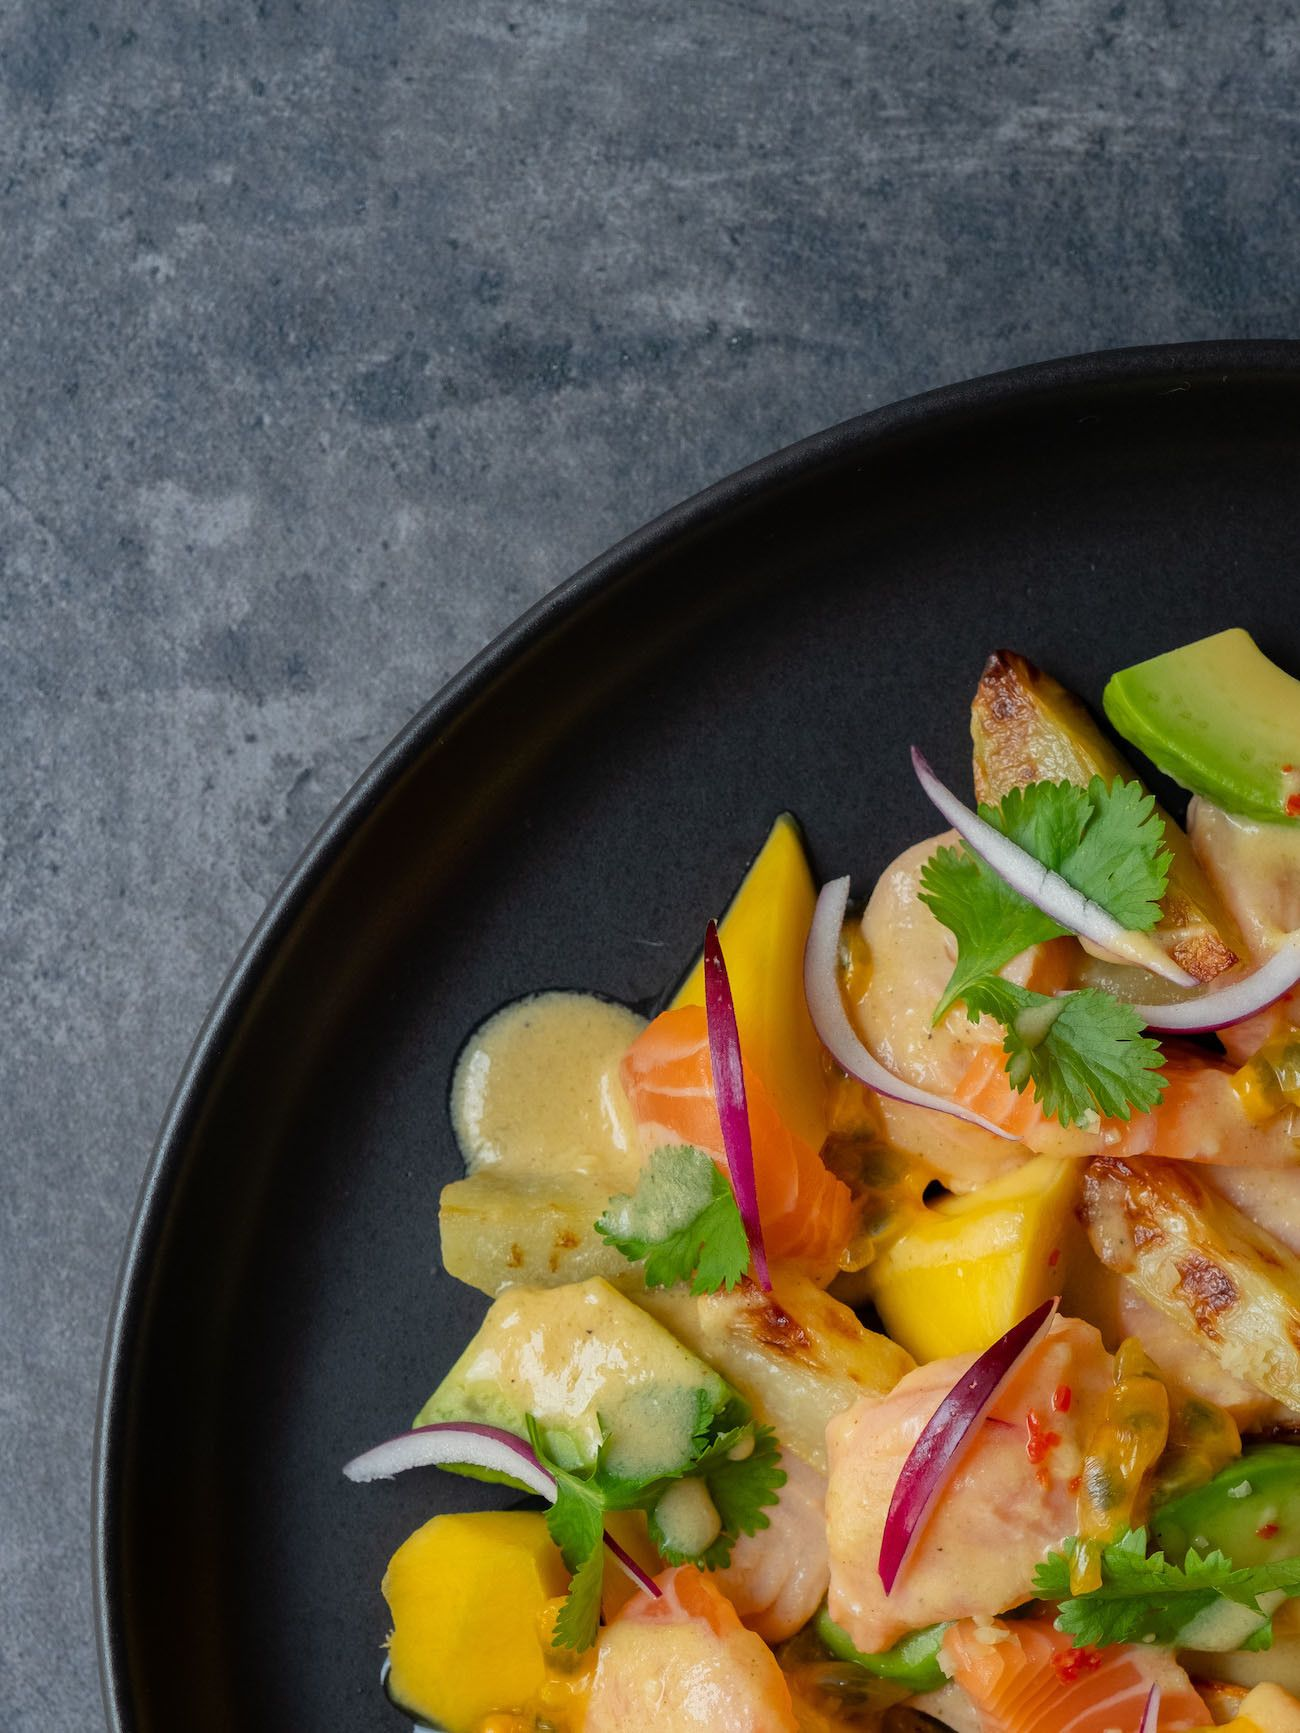 Foodblog, About Fuel, CEVICHE Das Kochbuch, Juan Danilo, Mango, Koriander, Avocado